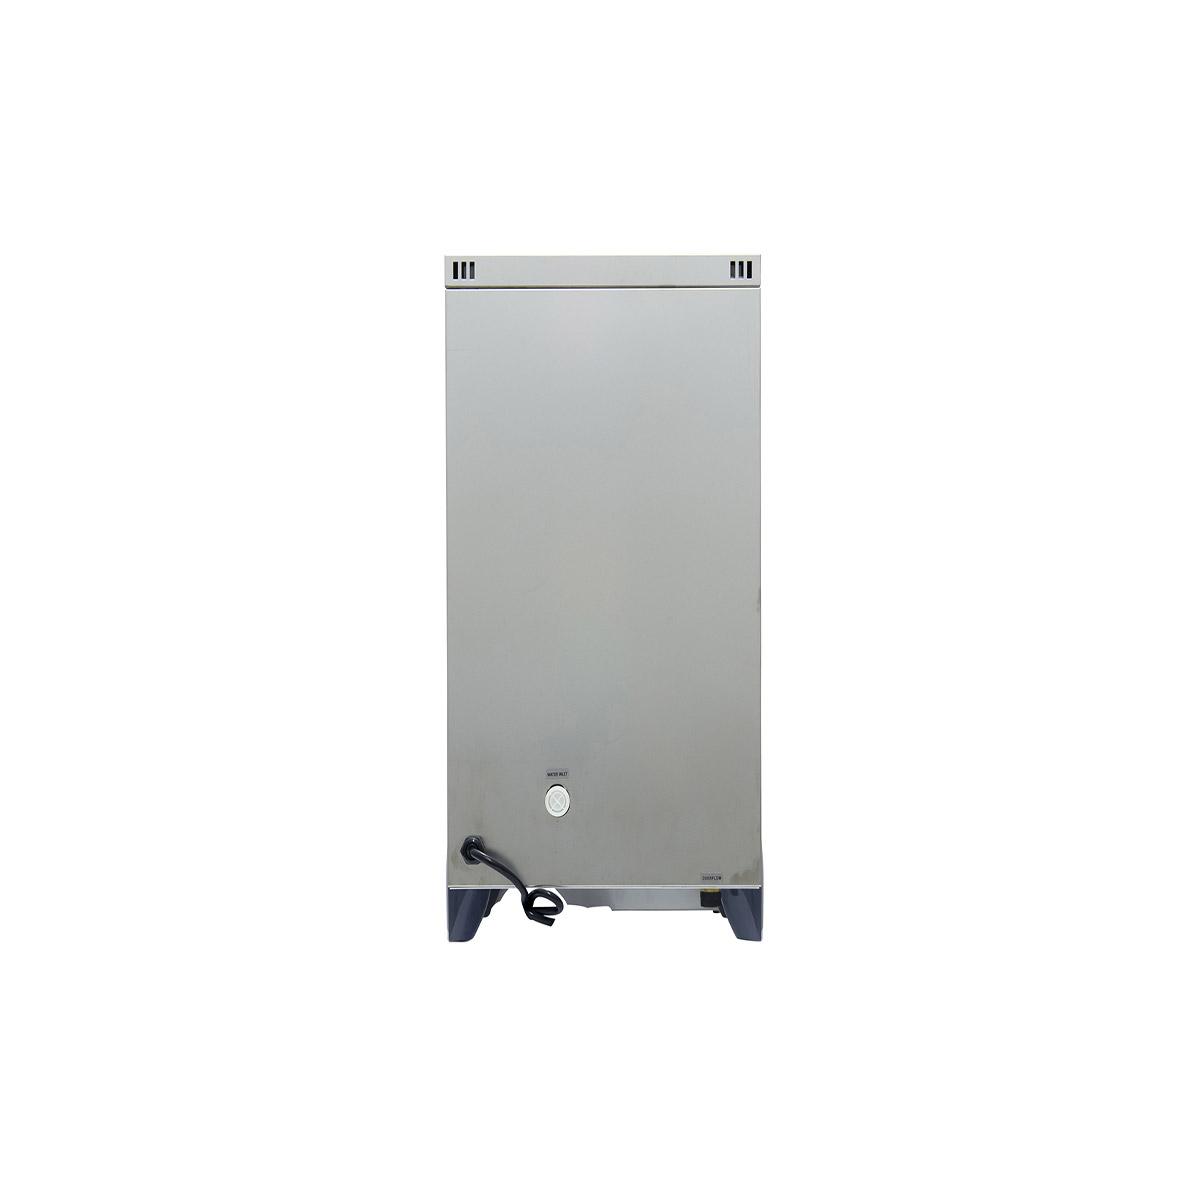 Instanta Sureflow High Volume Counter Top Water Boiler CTSV36T/9 Twin Taps 36Ltr